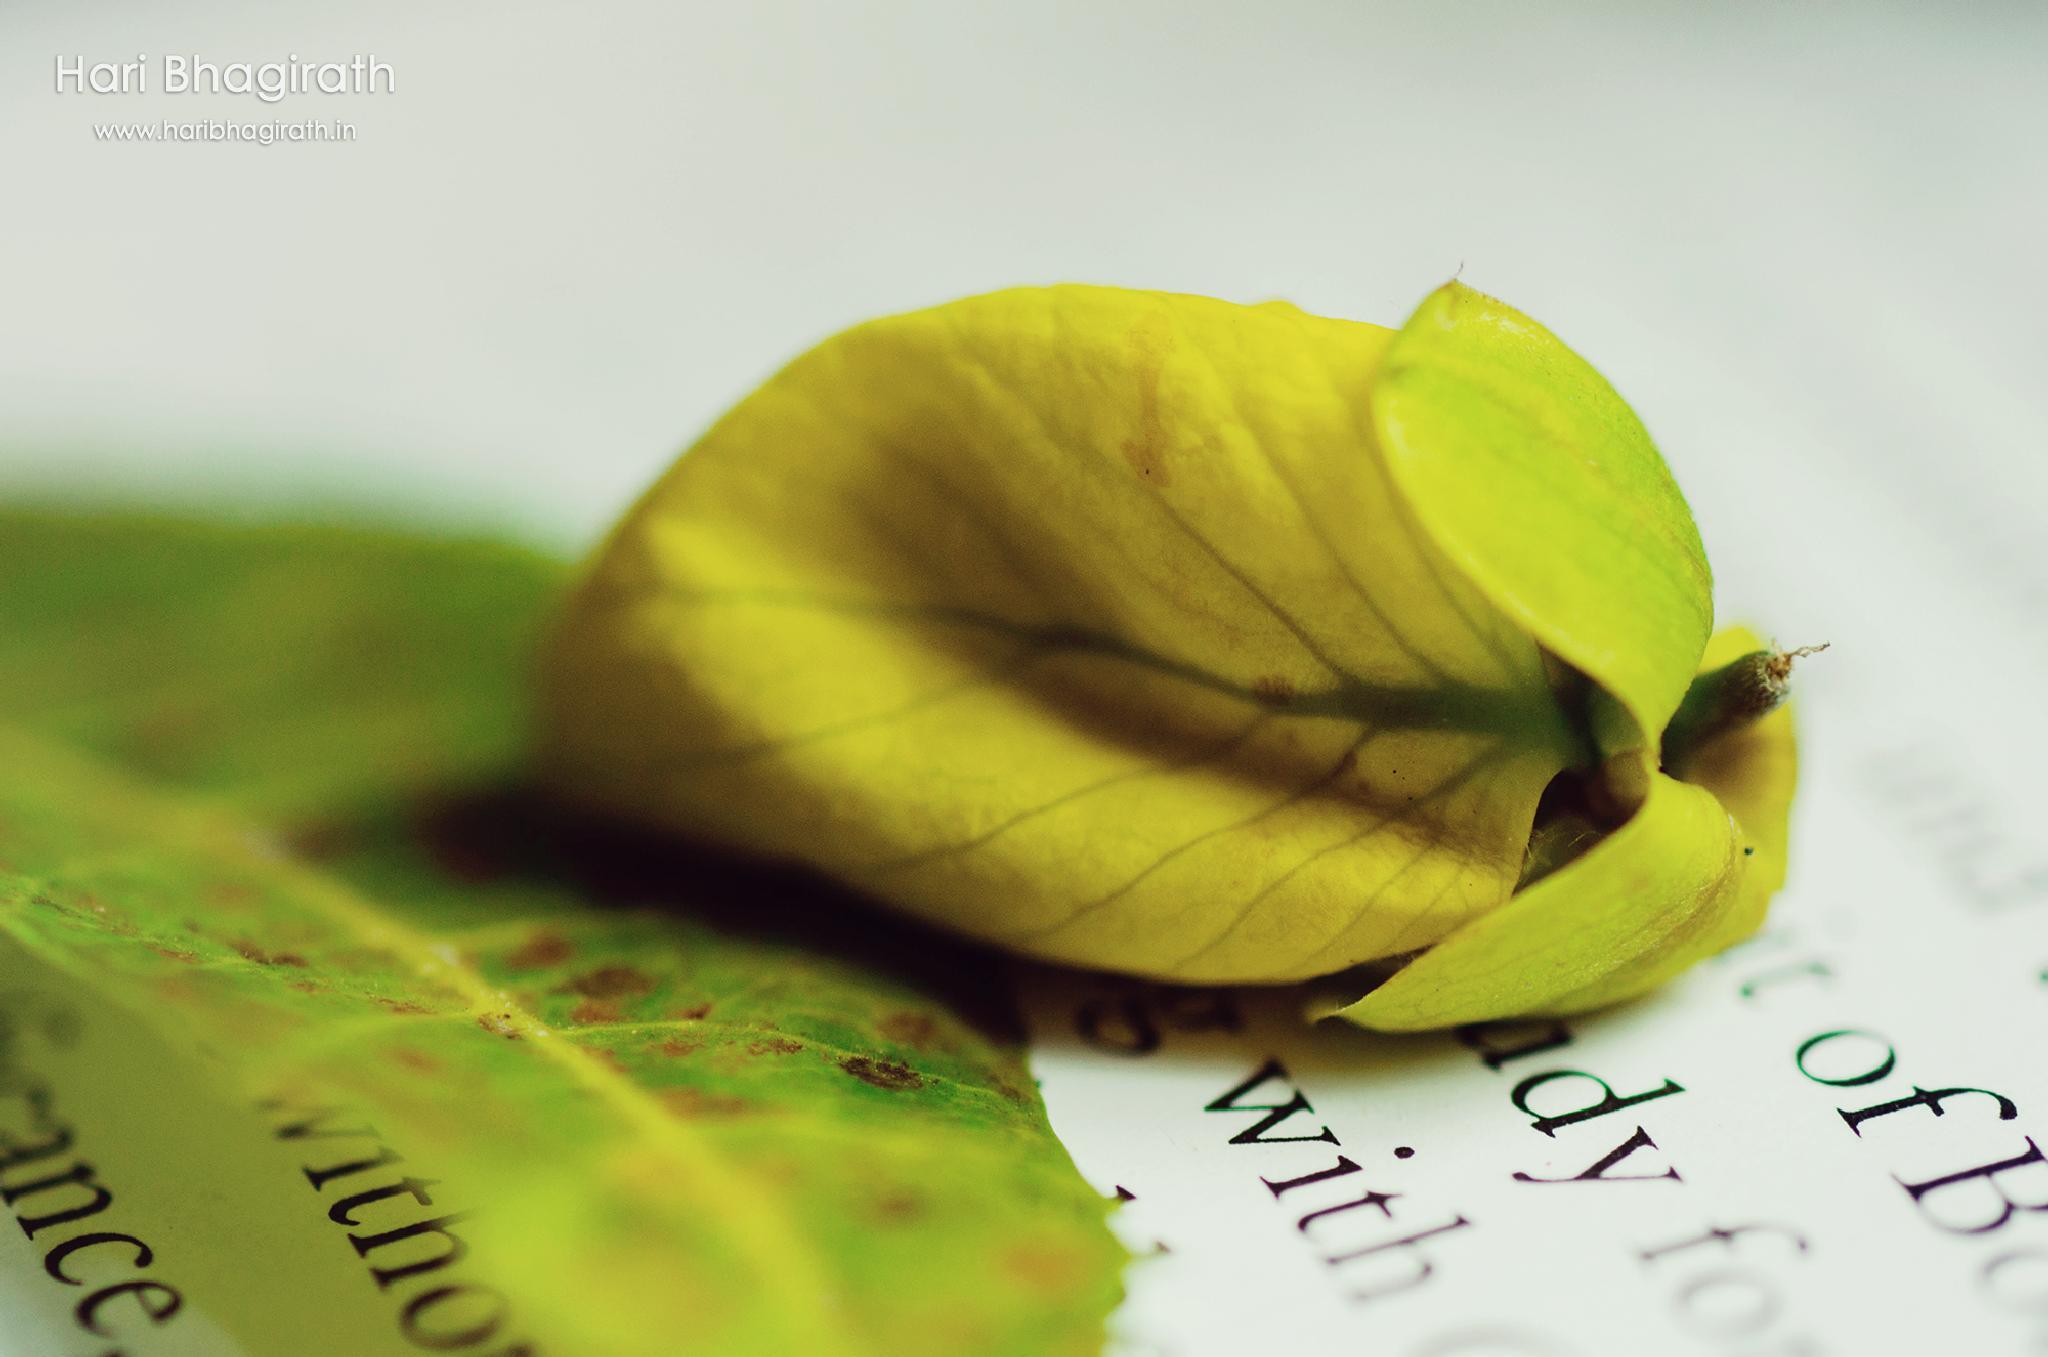 Turn the Page by Hari Bhagirath